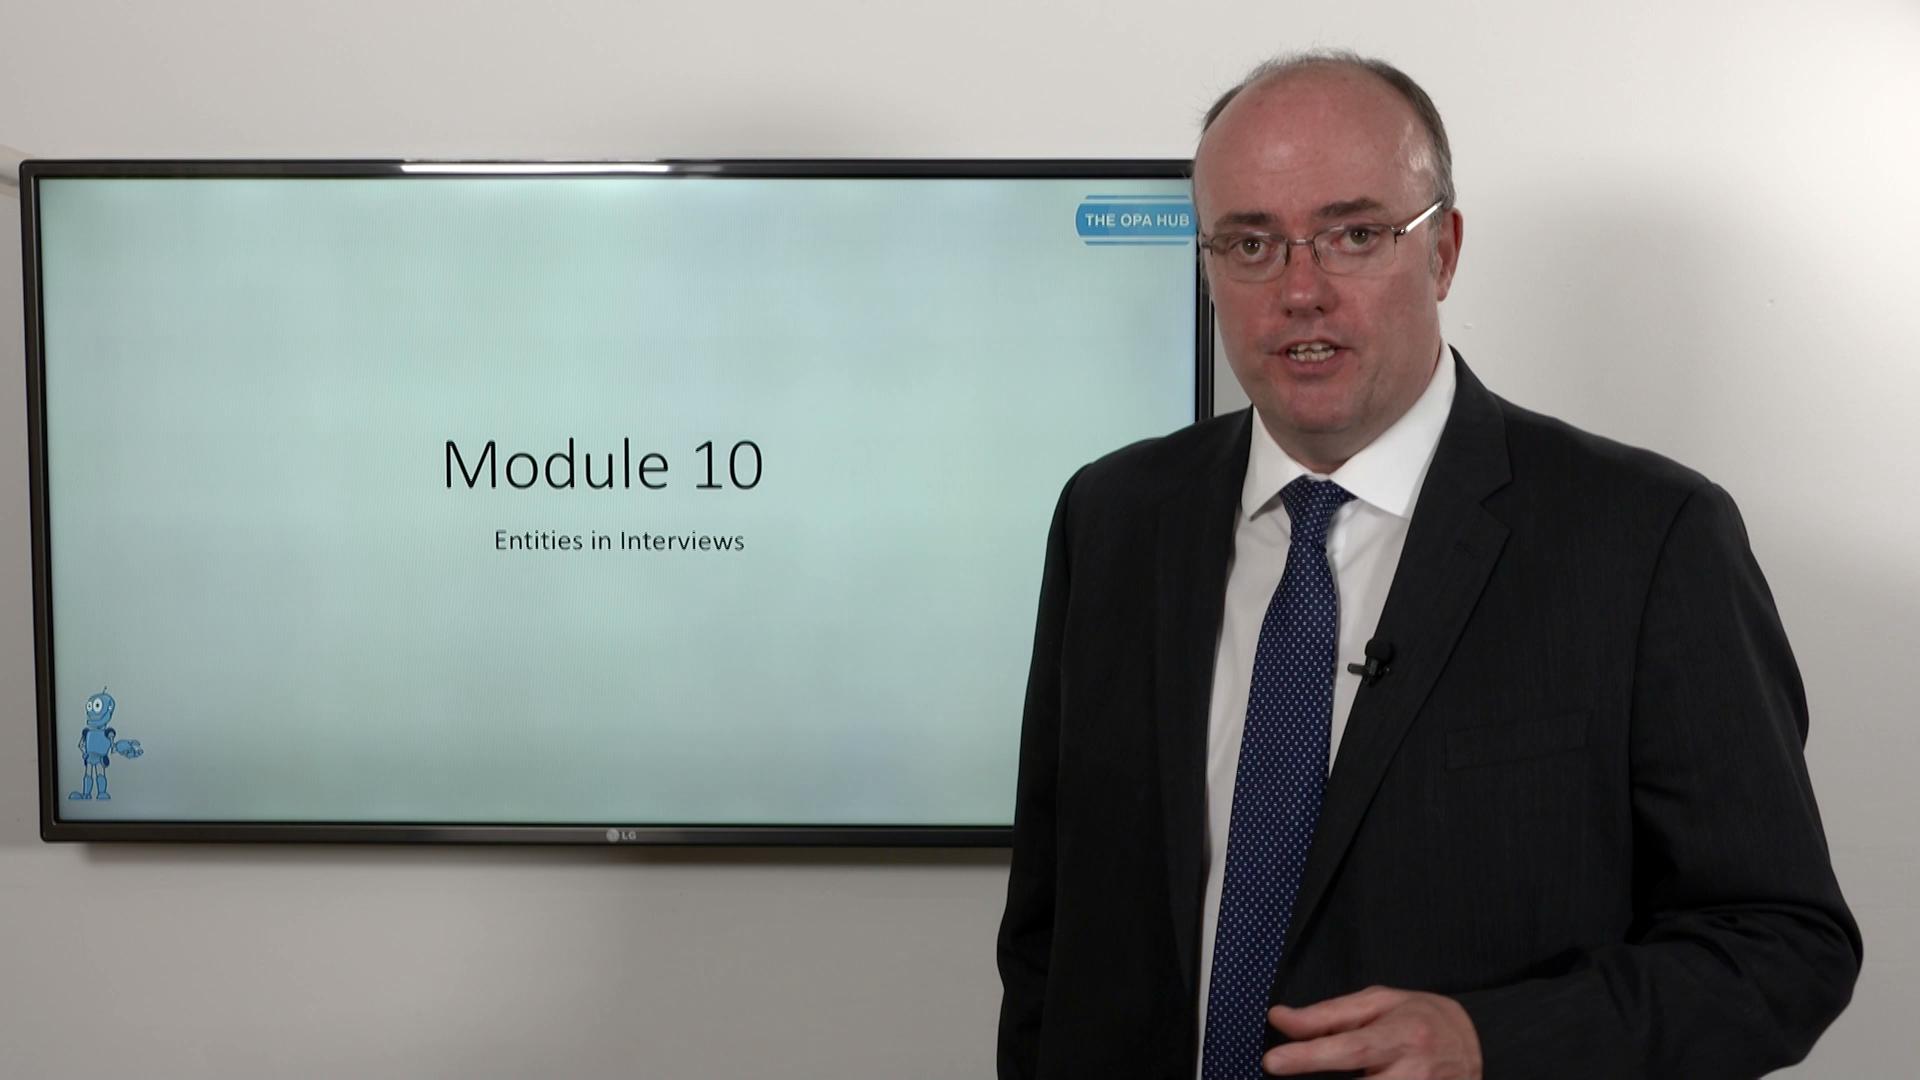 Training - Module 10